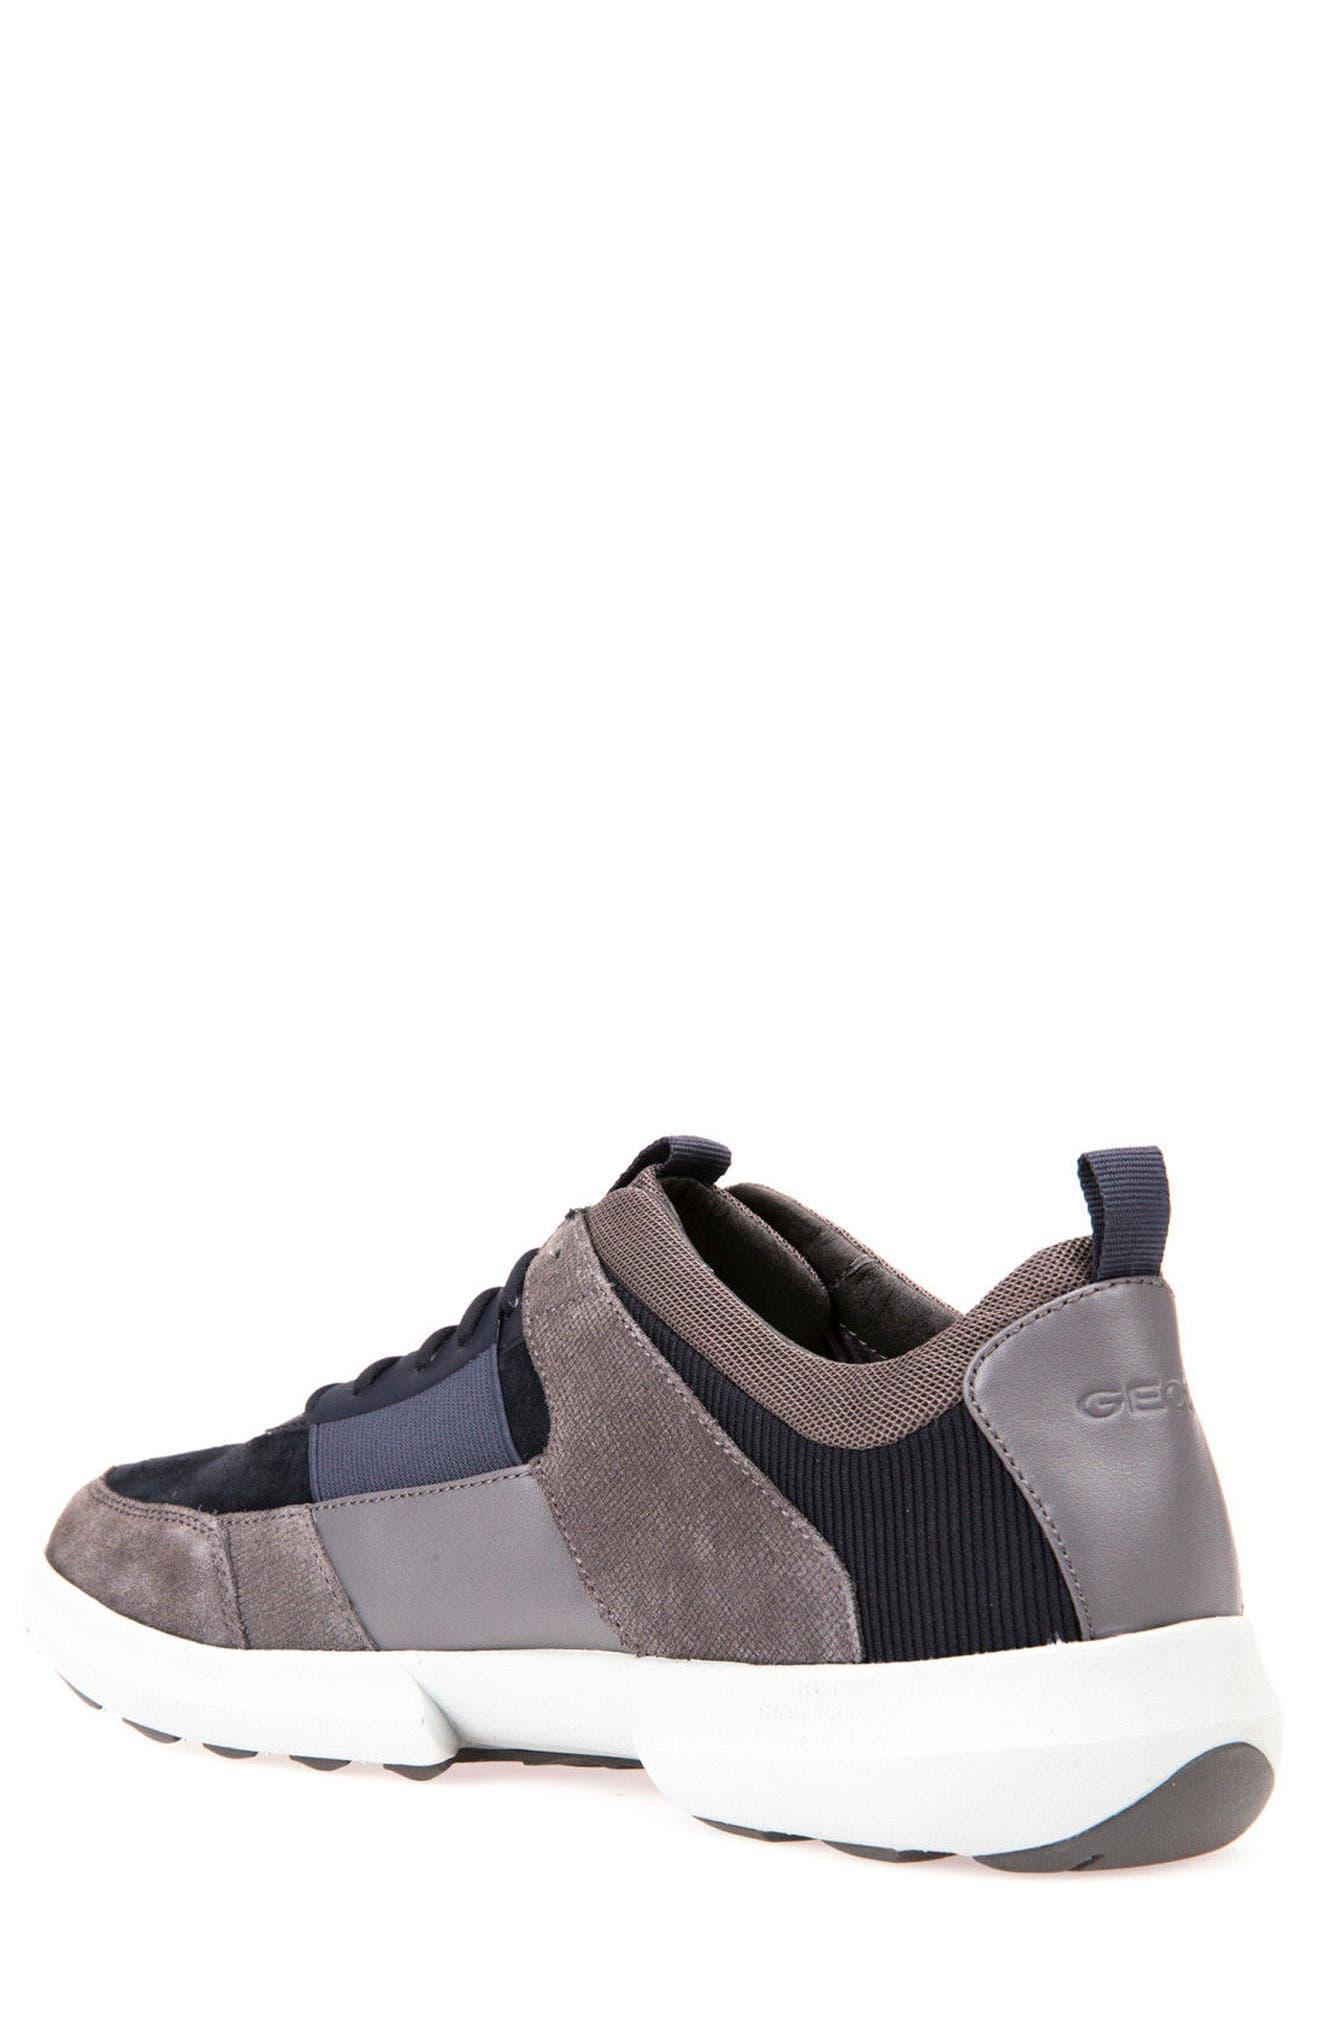 Traccia 5 Sneaker,                             Alternate thumbnail 2, color,                             Navy/ Anthracite